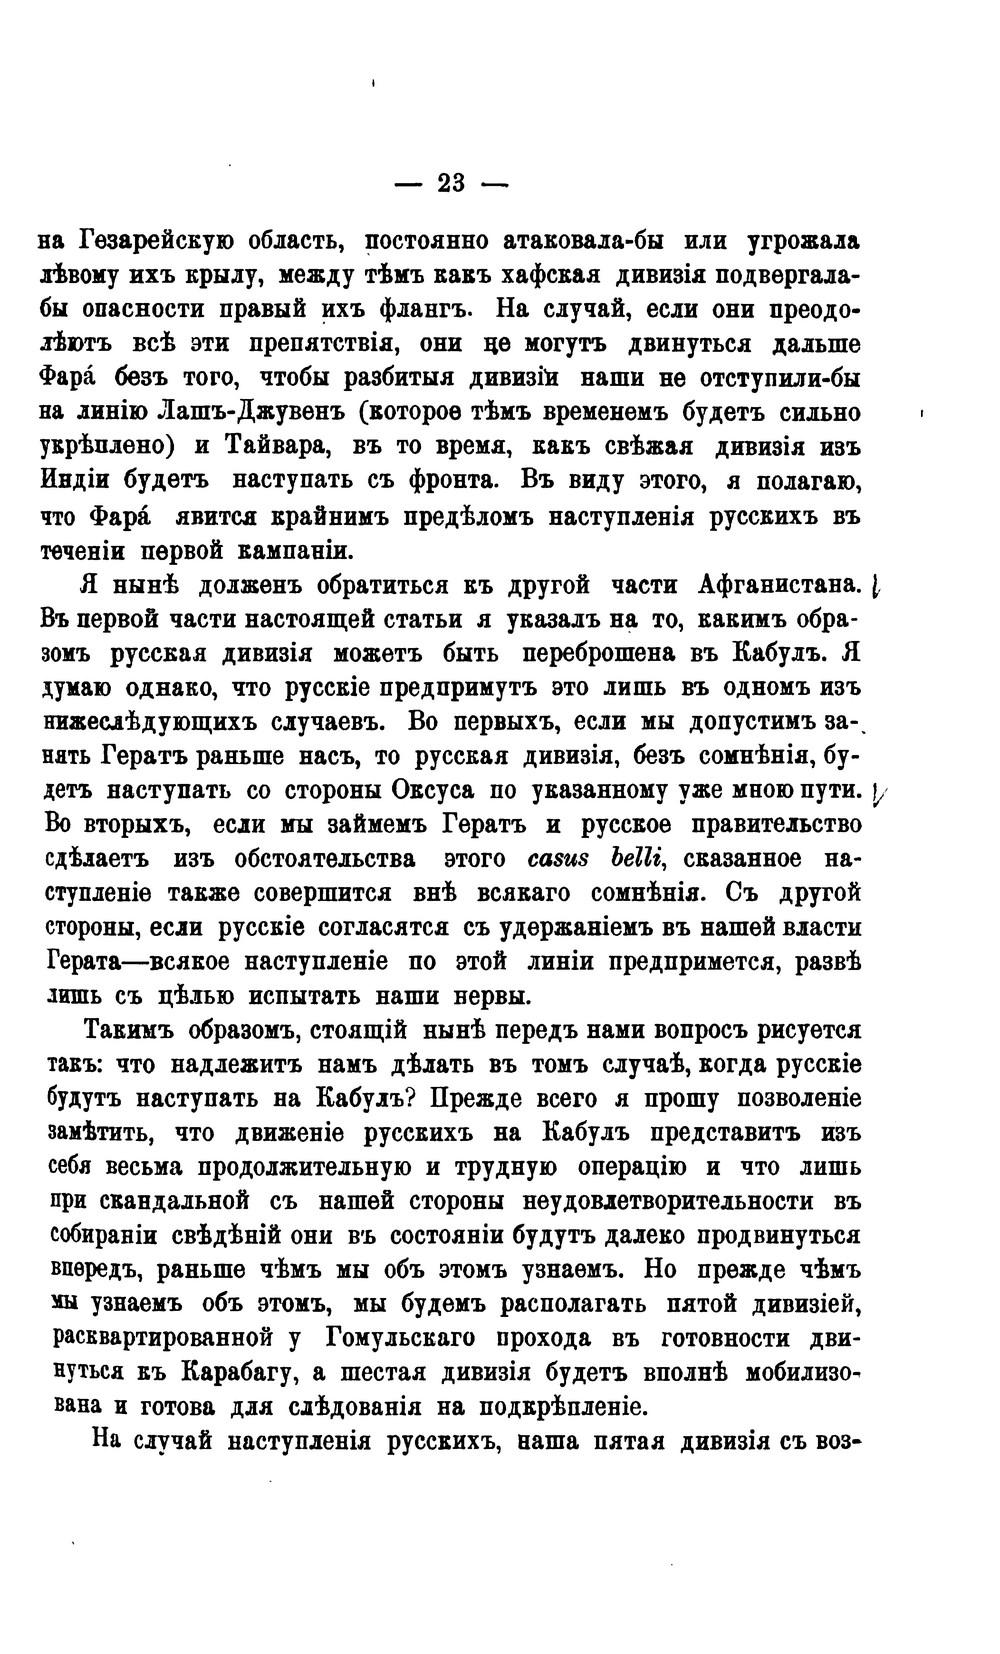 http://i5.imageban.ru/out/2013/08/29/06eada2a62dc02588148c7511eb5c0bb.jpg